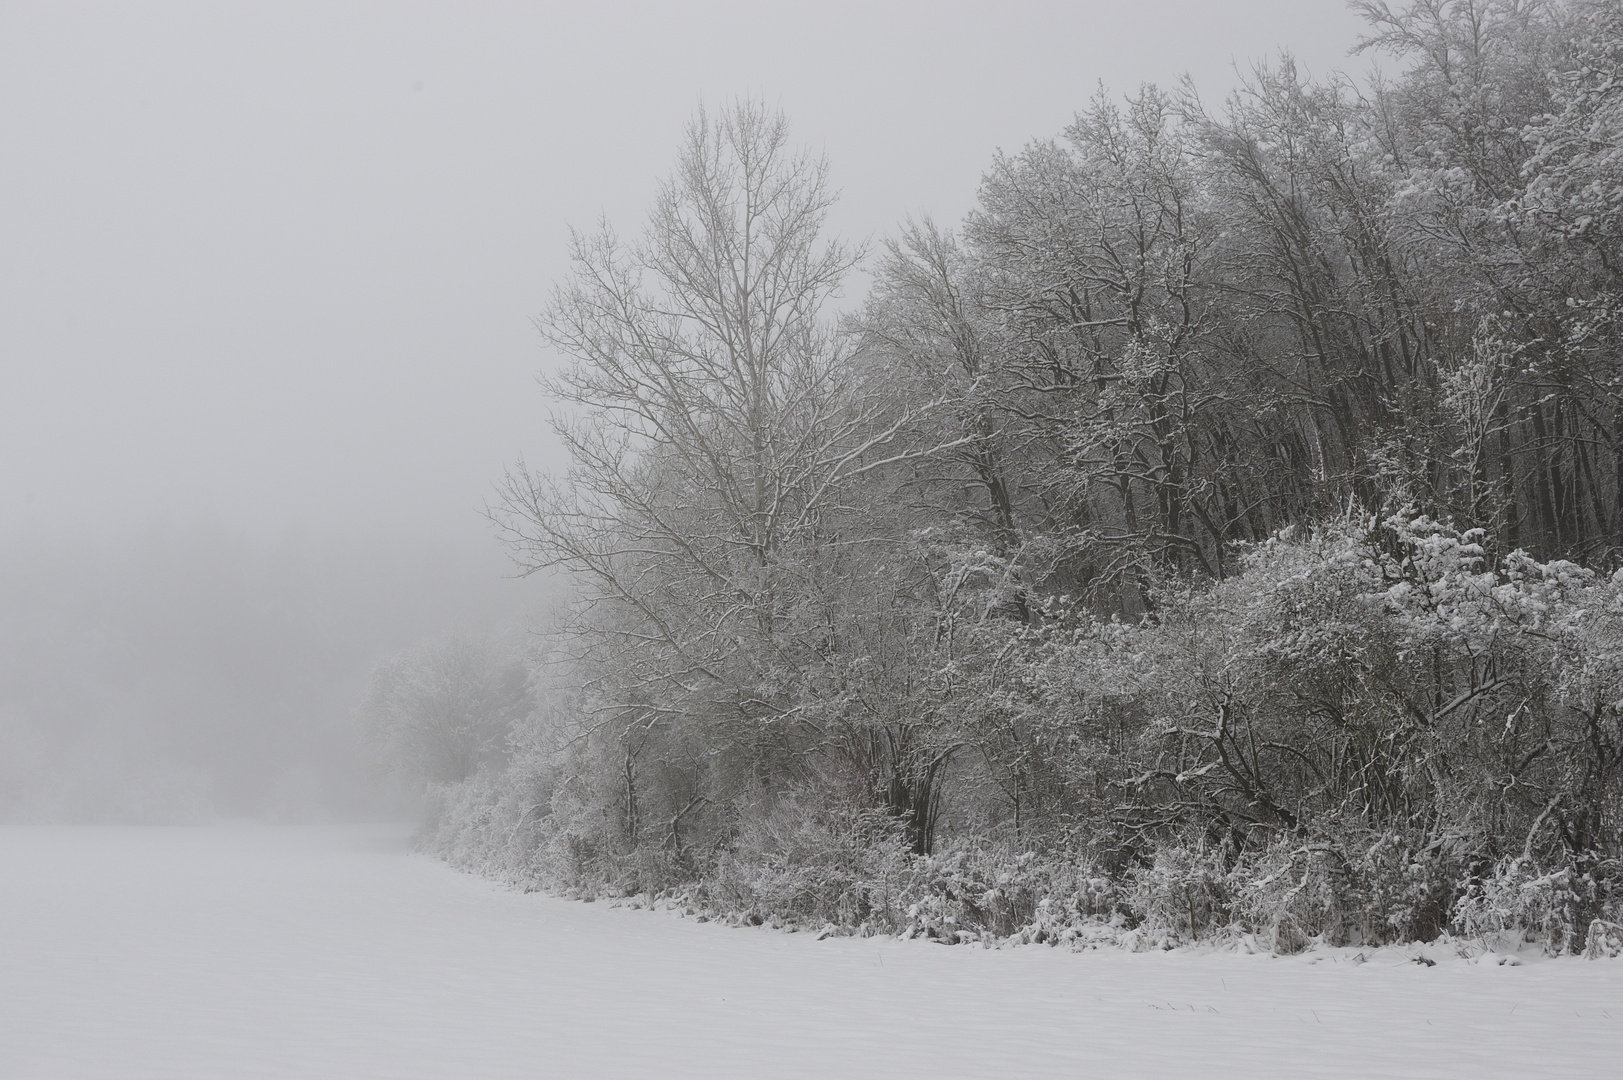 Frostnebel